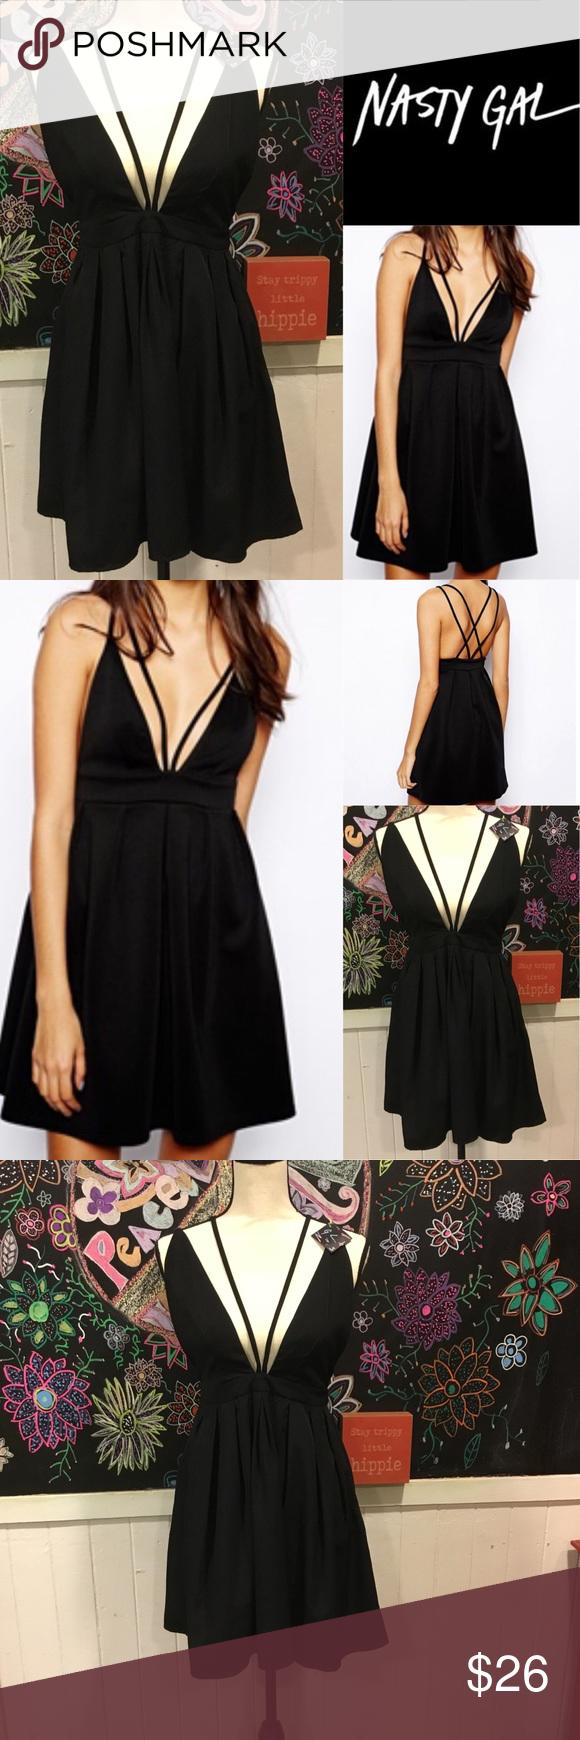 "ae03014d3494b5 Nwts Nasty Gal szS sexy black Dress New with tags nasty gal sexy black dress.  Plunge neckline and fun back. Waist is 26"" Nasty Gal Dresses"